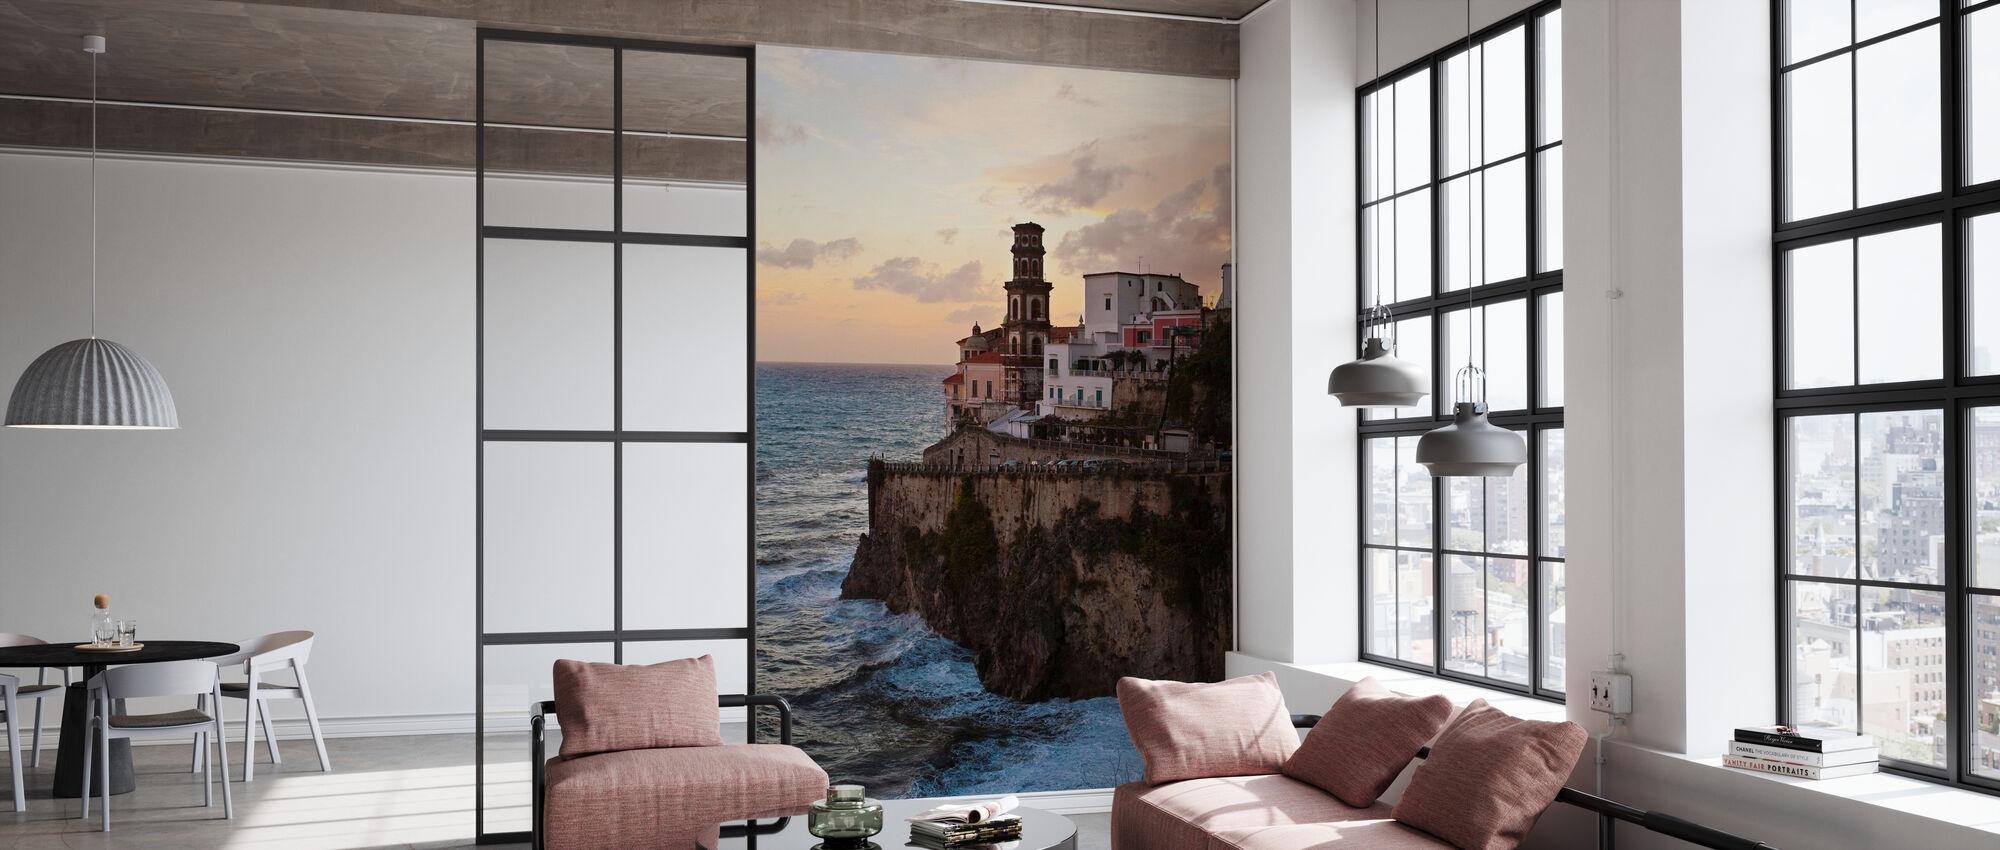 Vietri Sul Mare, Italia - Tapet - Kontor